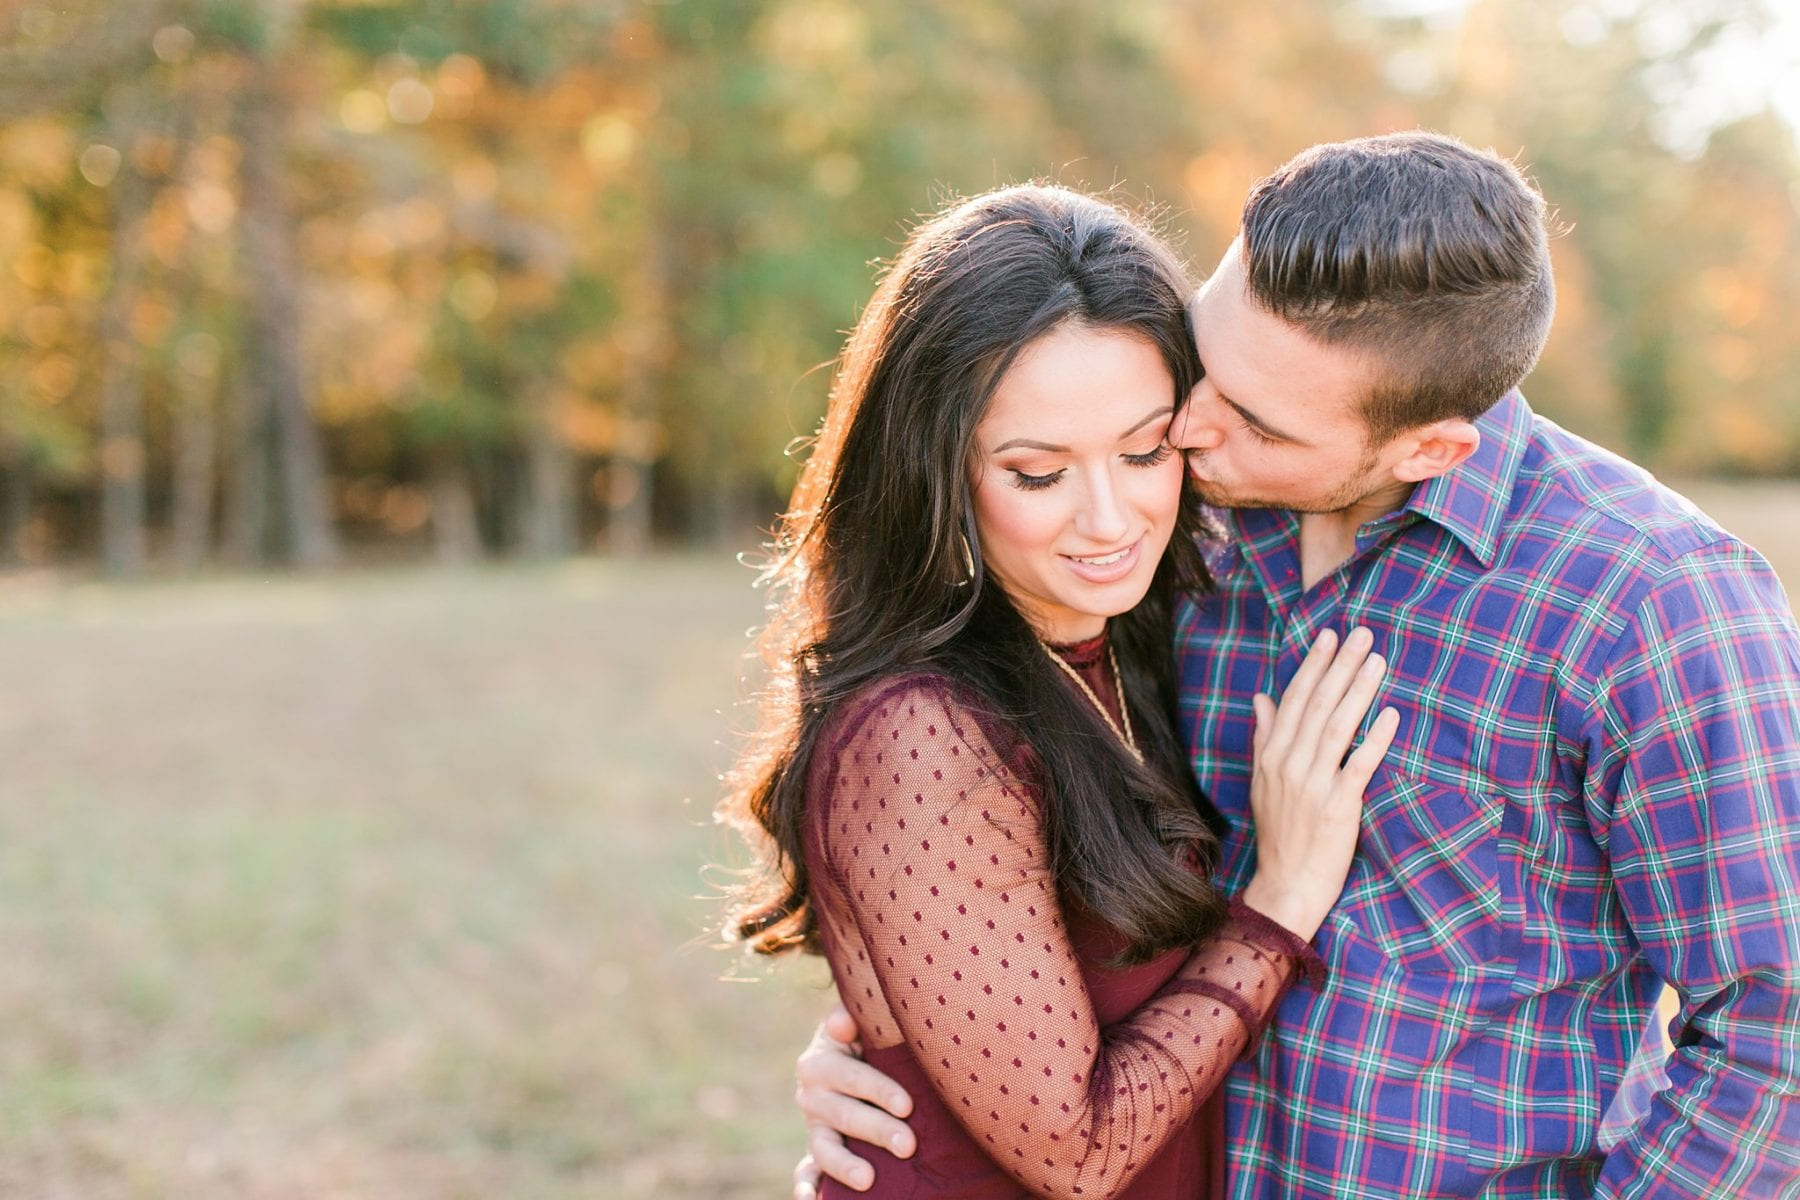 Manassas Battlefield Portraits Virginia Wedding Photographer Megan Kelsey Photography Lianne & Chris-10.jpg